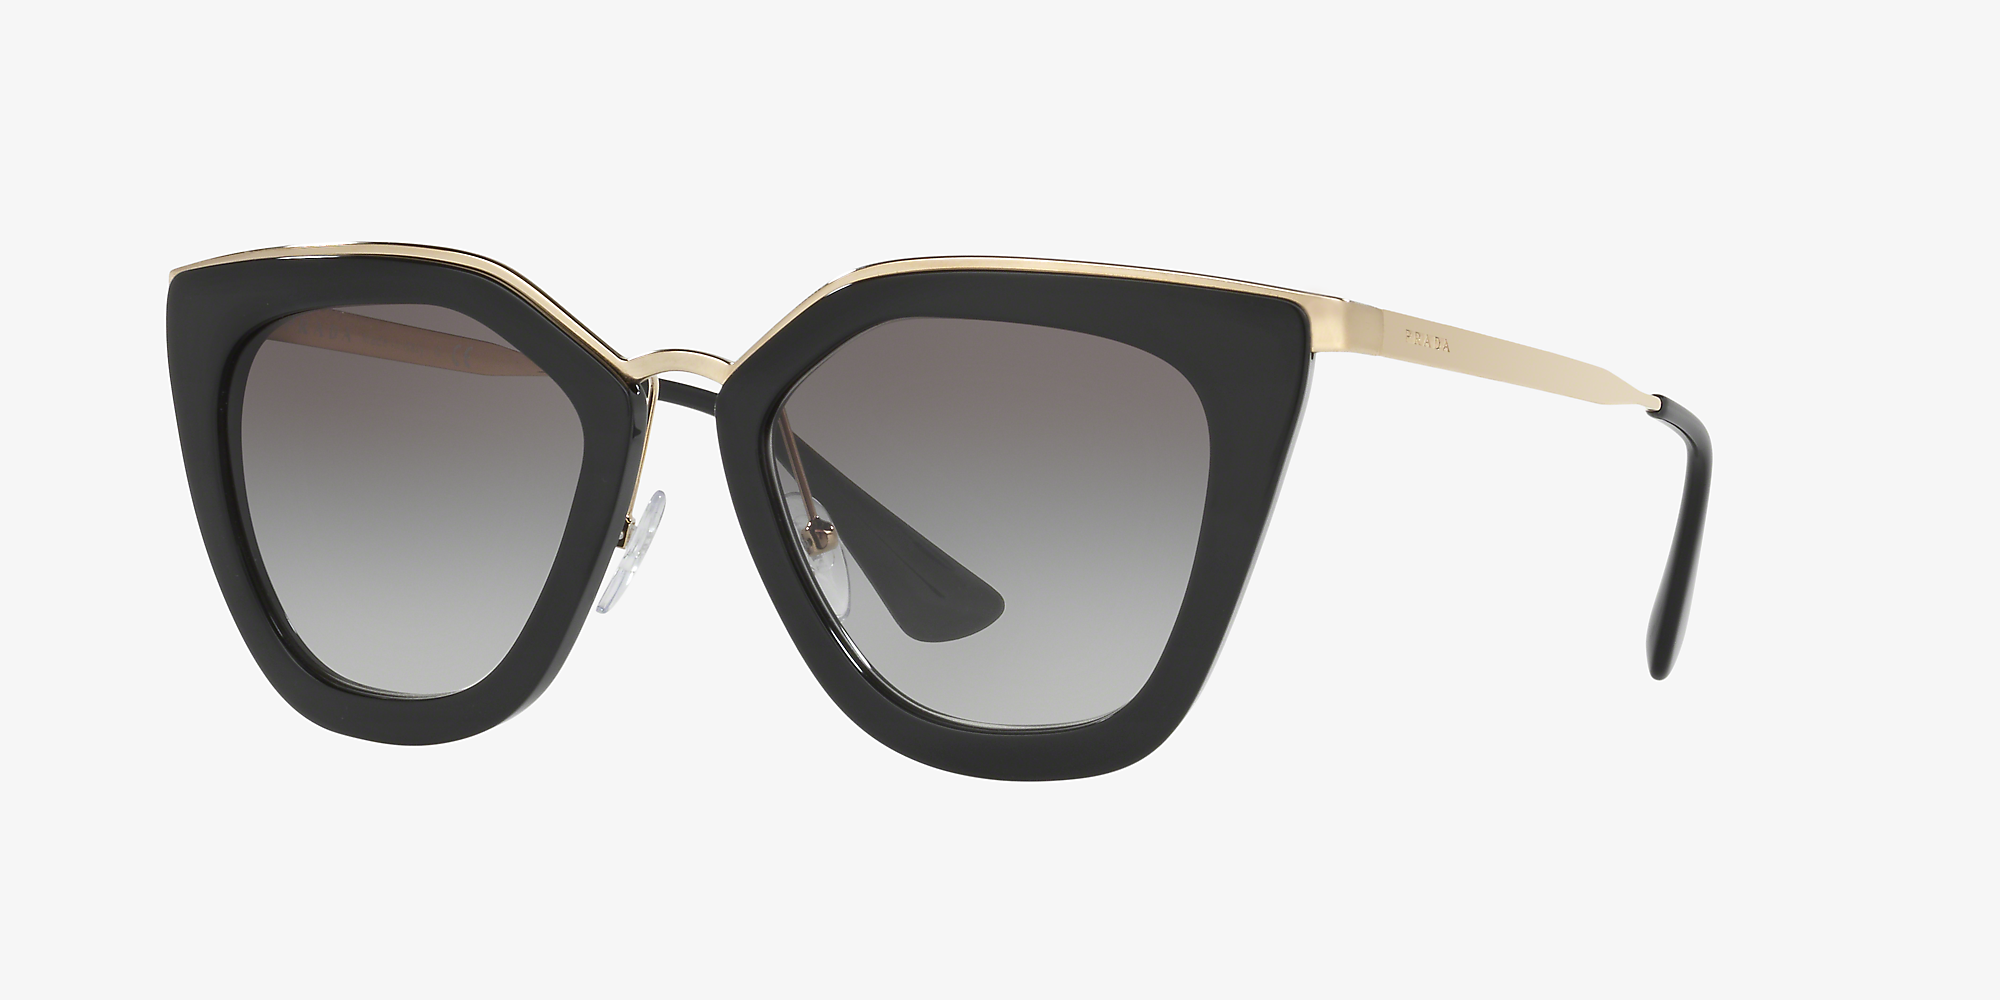 09f8afebcab4 Prada PR 53SS 52 Grey-Black & Black Sunglasses   Sunglass Hut Australia